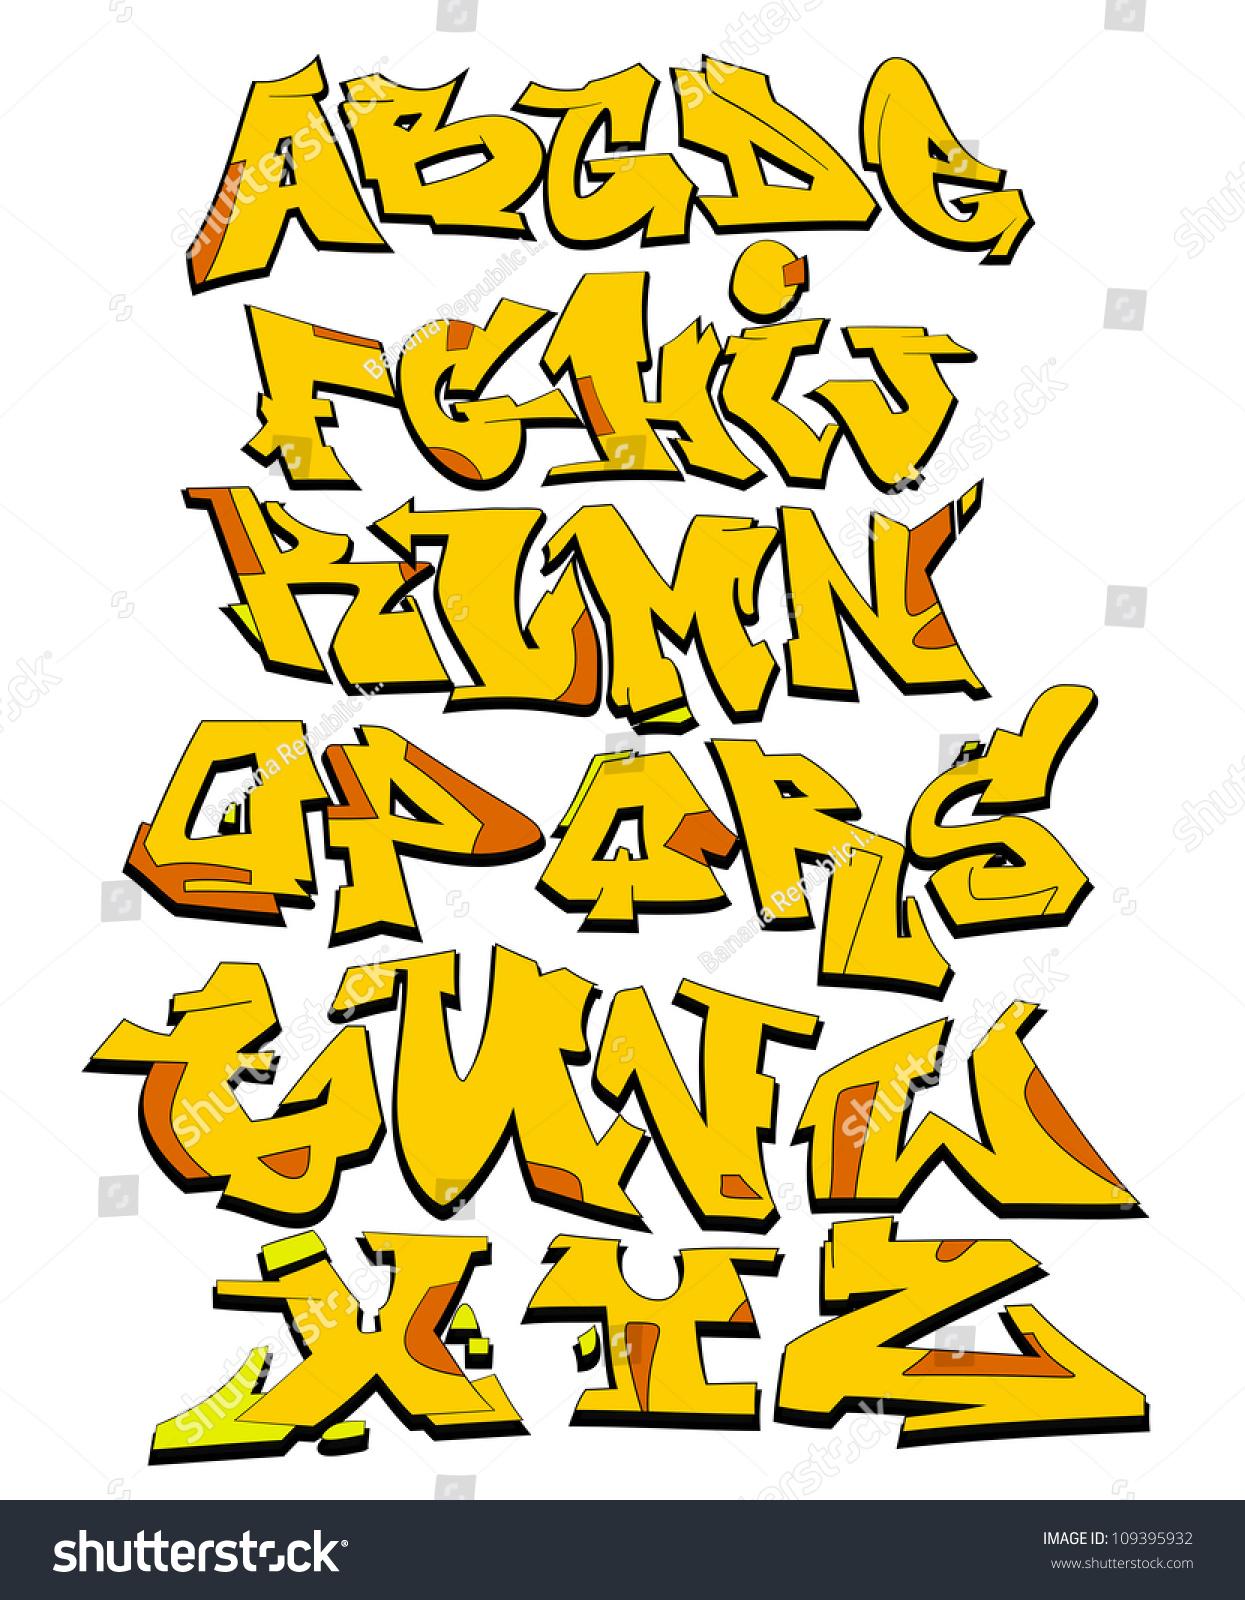 Graffiti art design - Graffiti Font Alphabet Urban Art Design